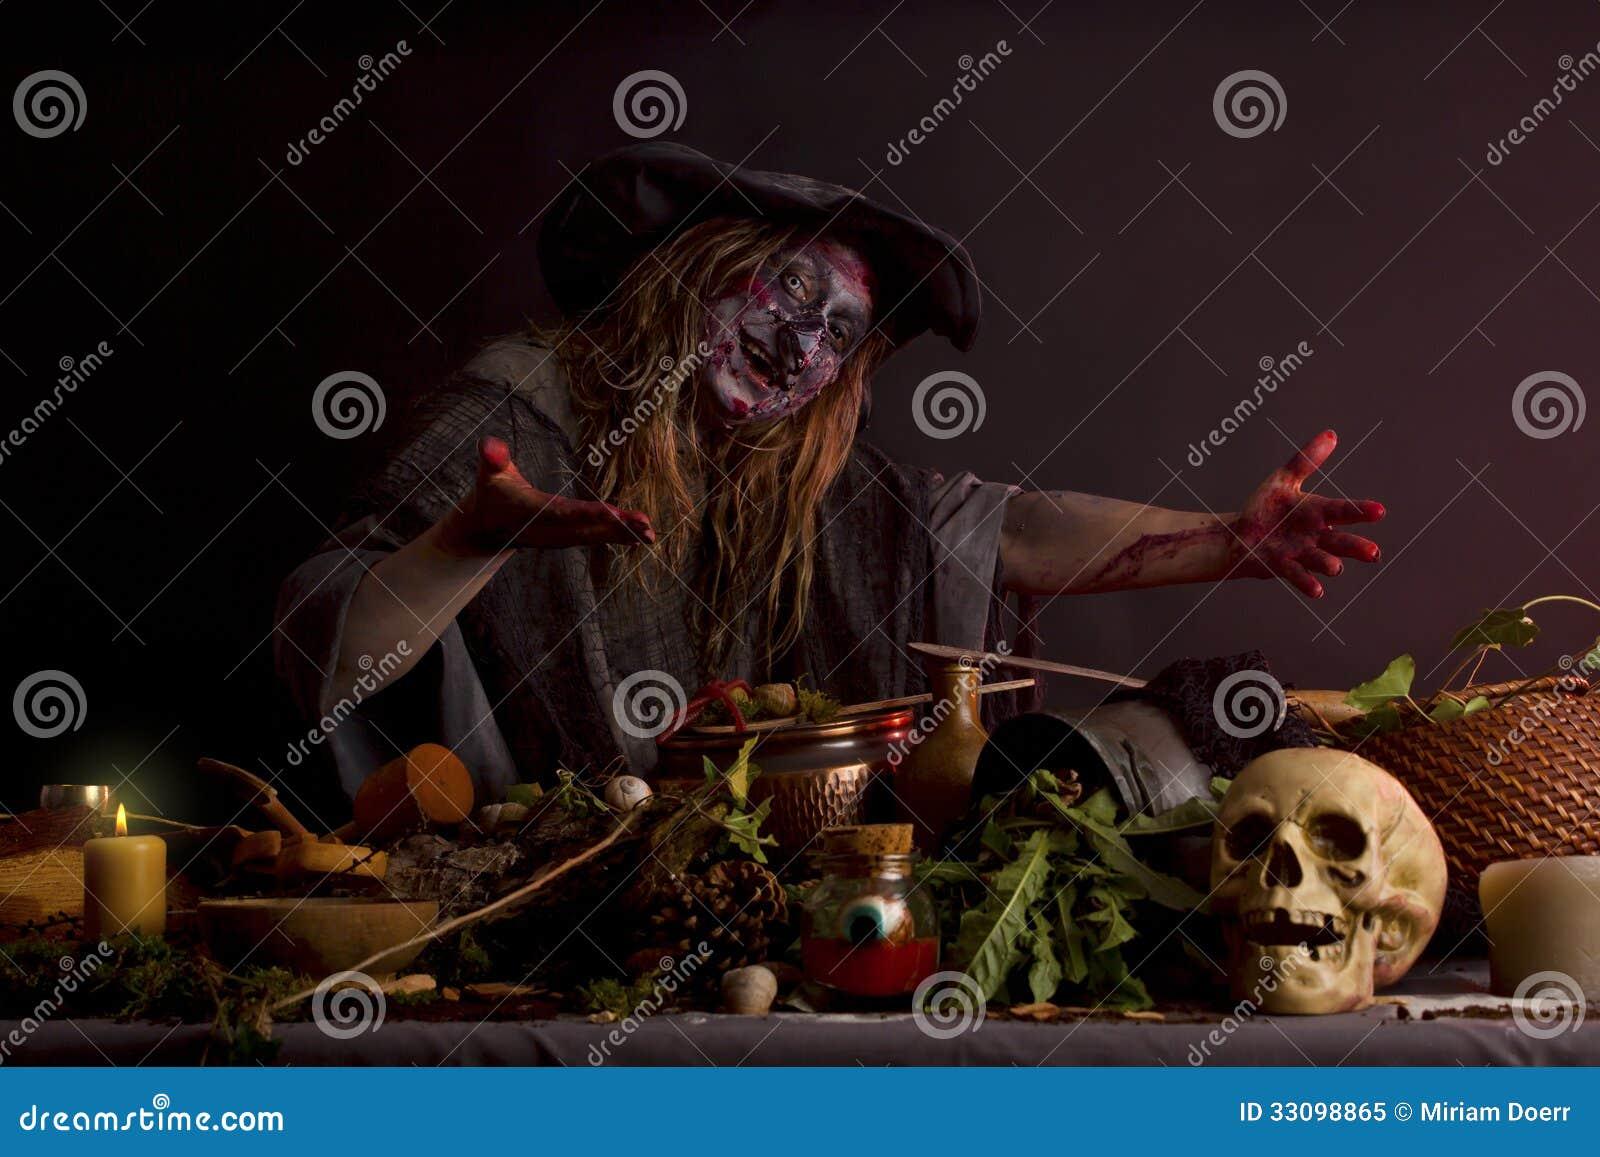 hexe zeigt ihre hexenküche lizenzfreies stockfoto - bild: 33098865